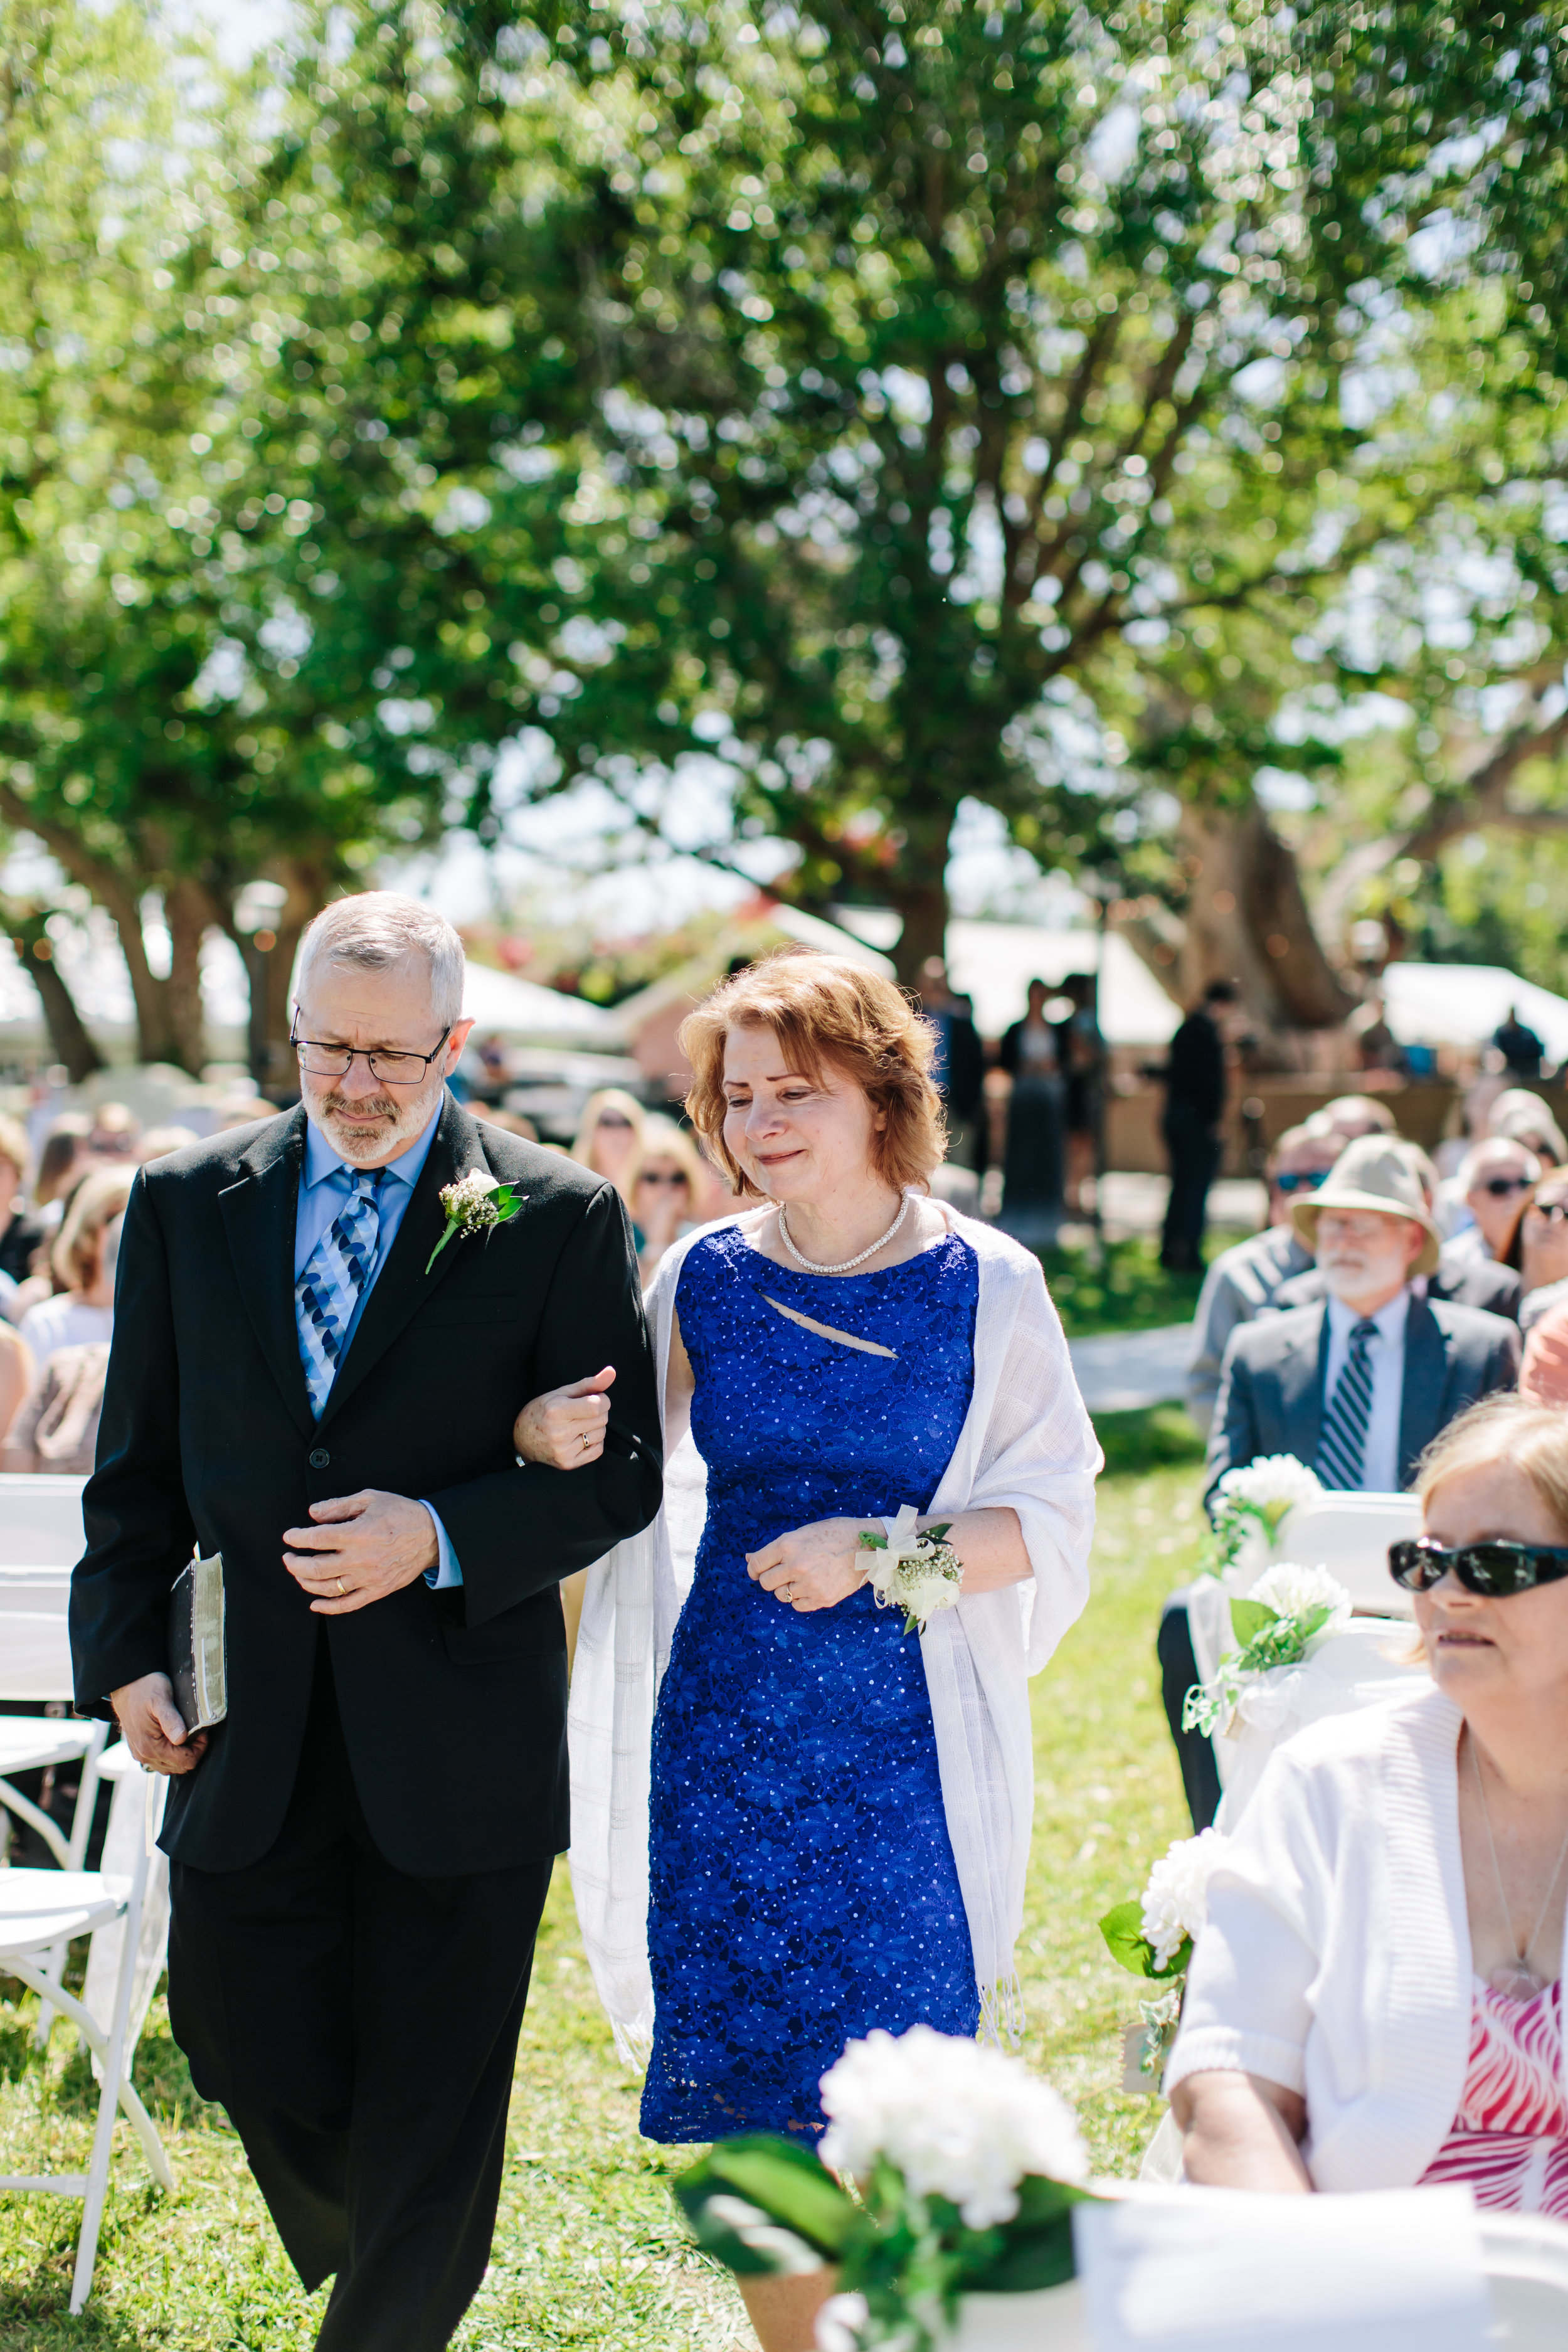 2018.03.17 Allison and Chuck Wedding Waelti Melbourne (208 of 900).jpg